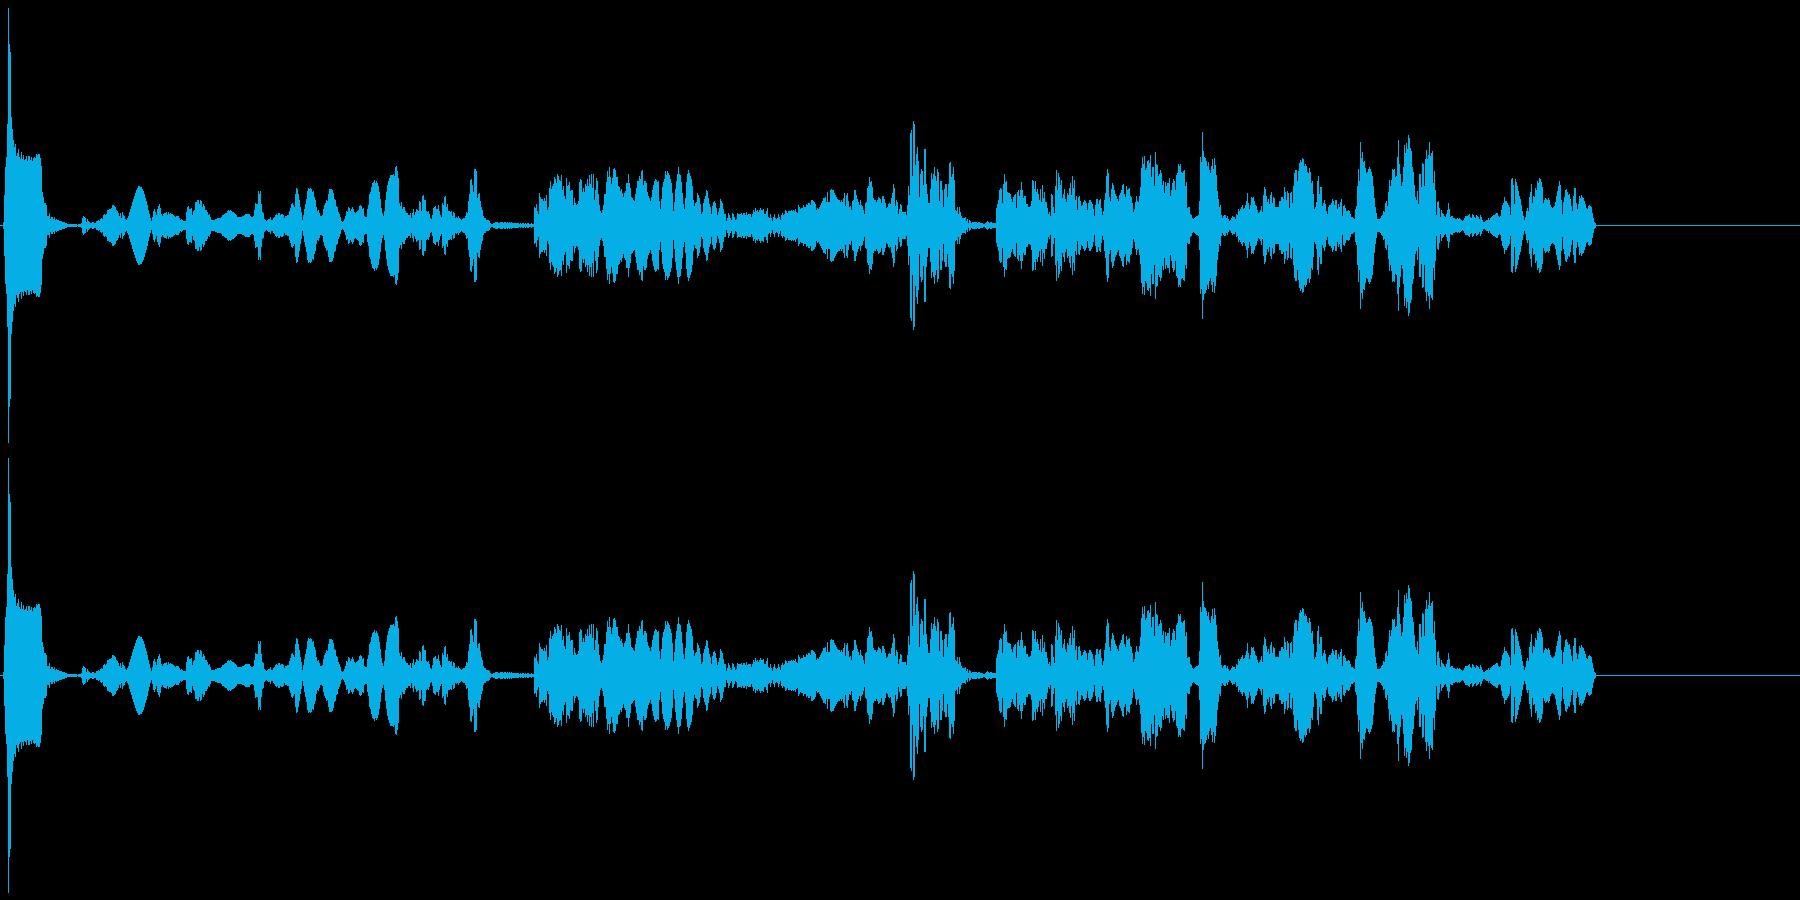 【SE 効果音】機会的なノイズ2の再生済みの波形